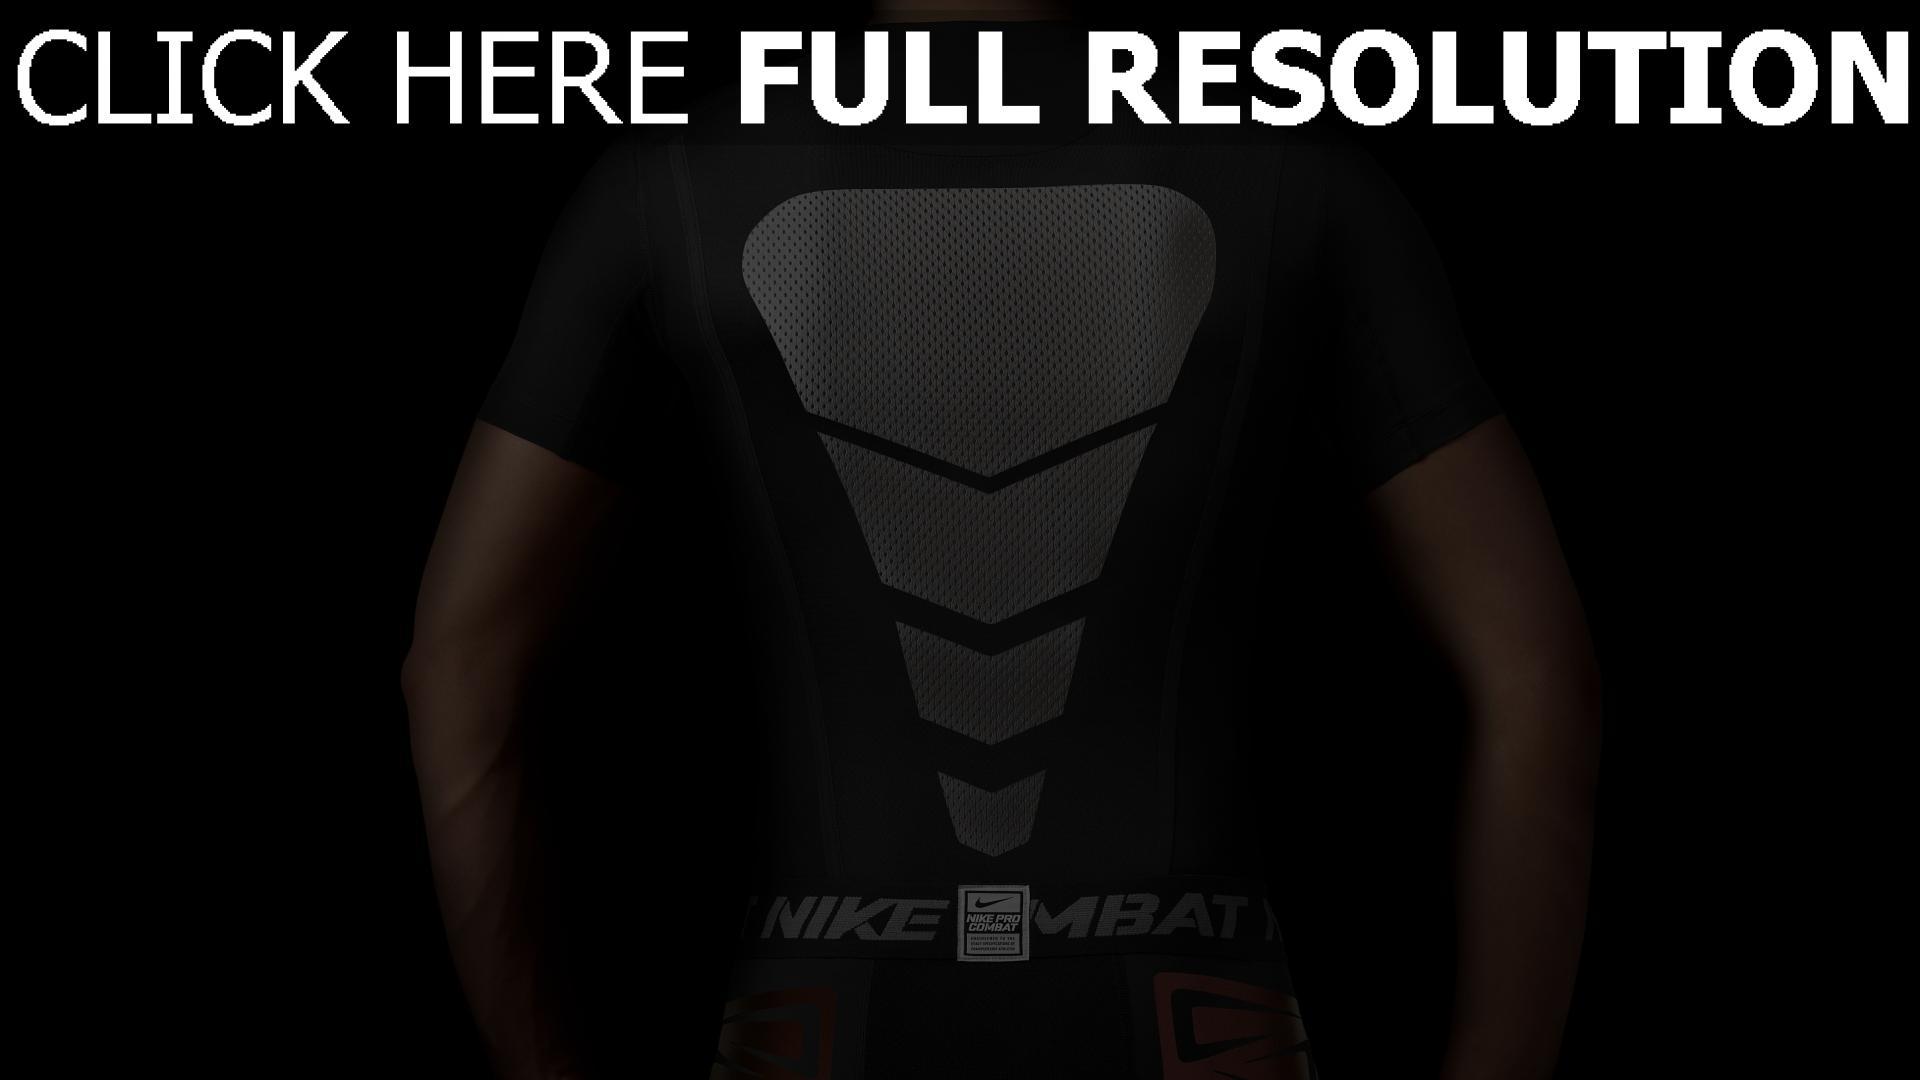 hd hintergrundbilder nike t-shirt shorts sport muster 1920x1080